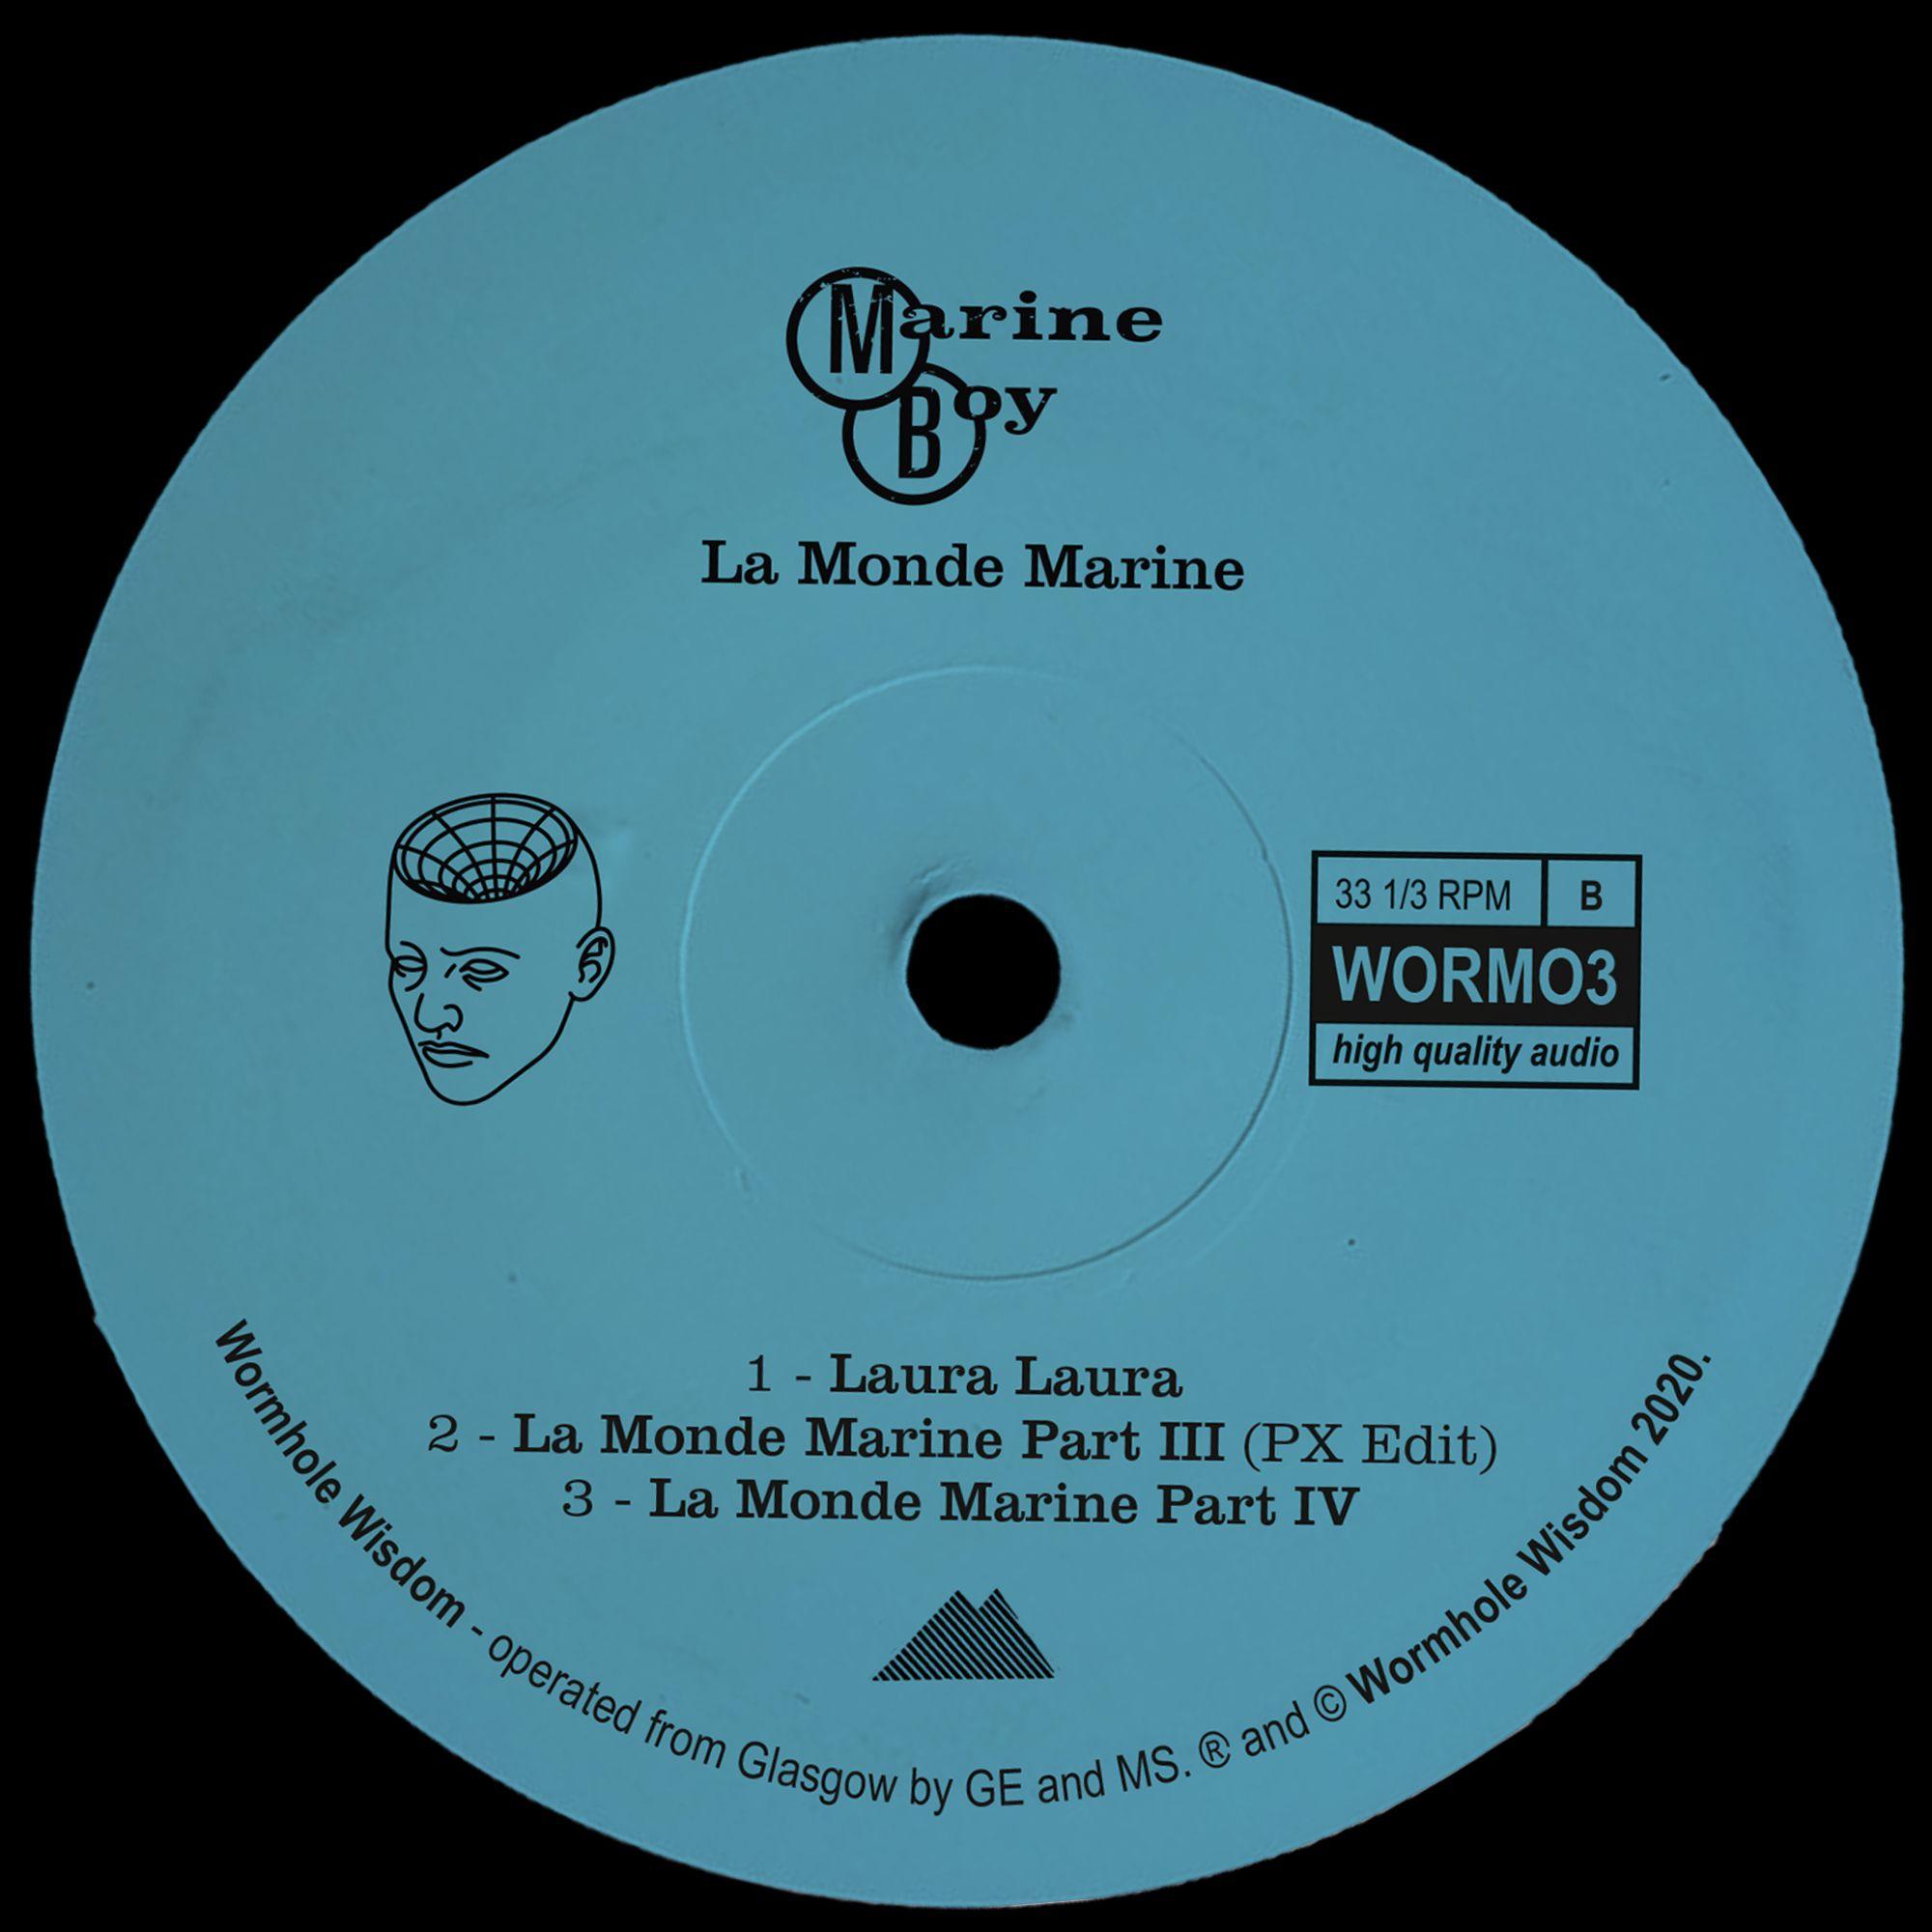 Marine Boy - Le Monde Marine